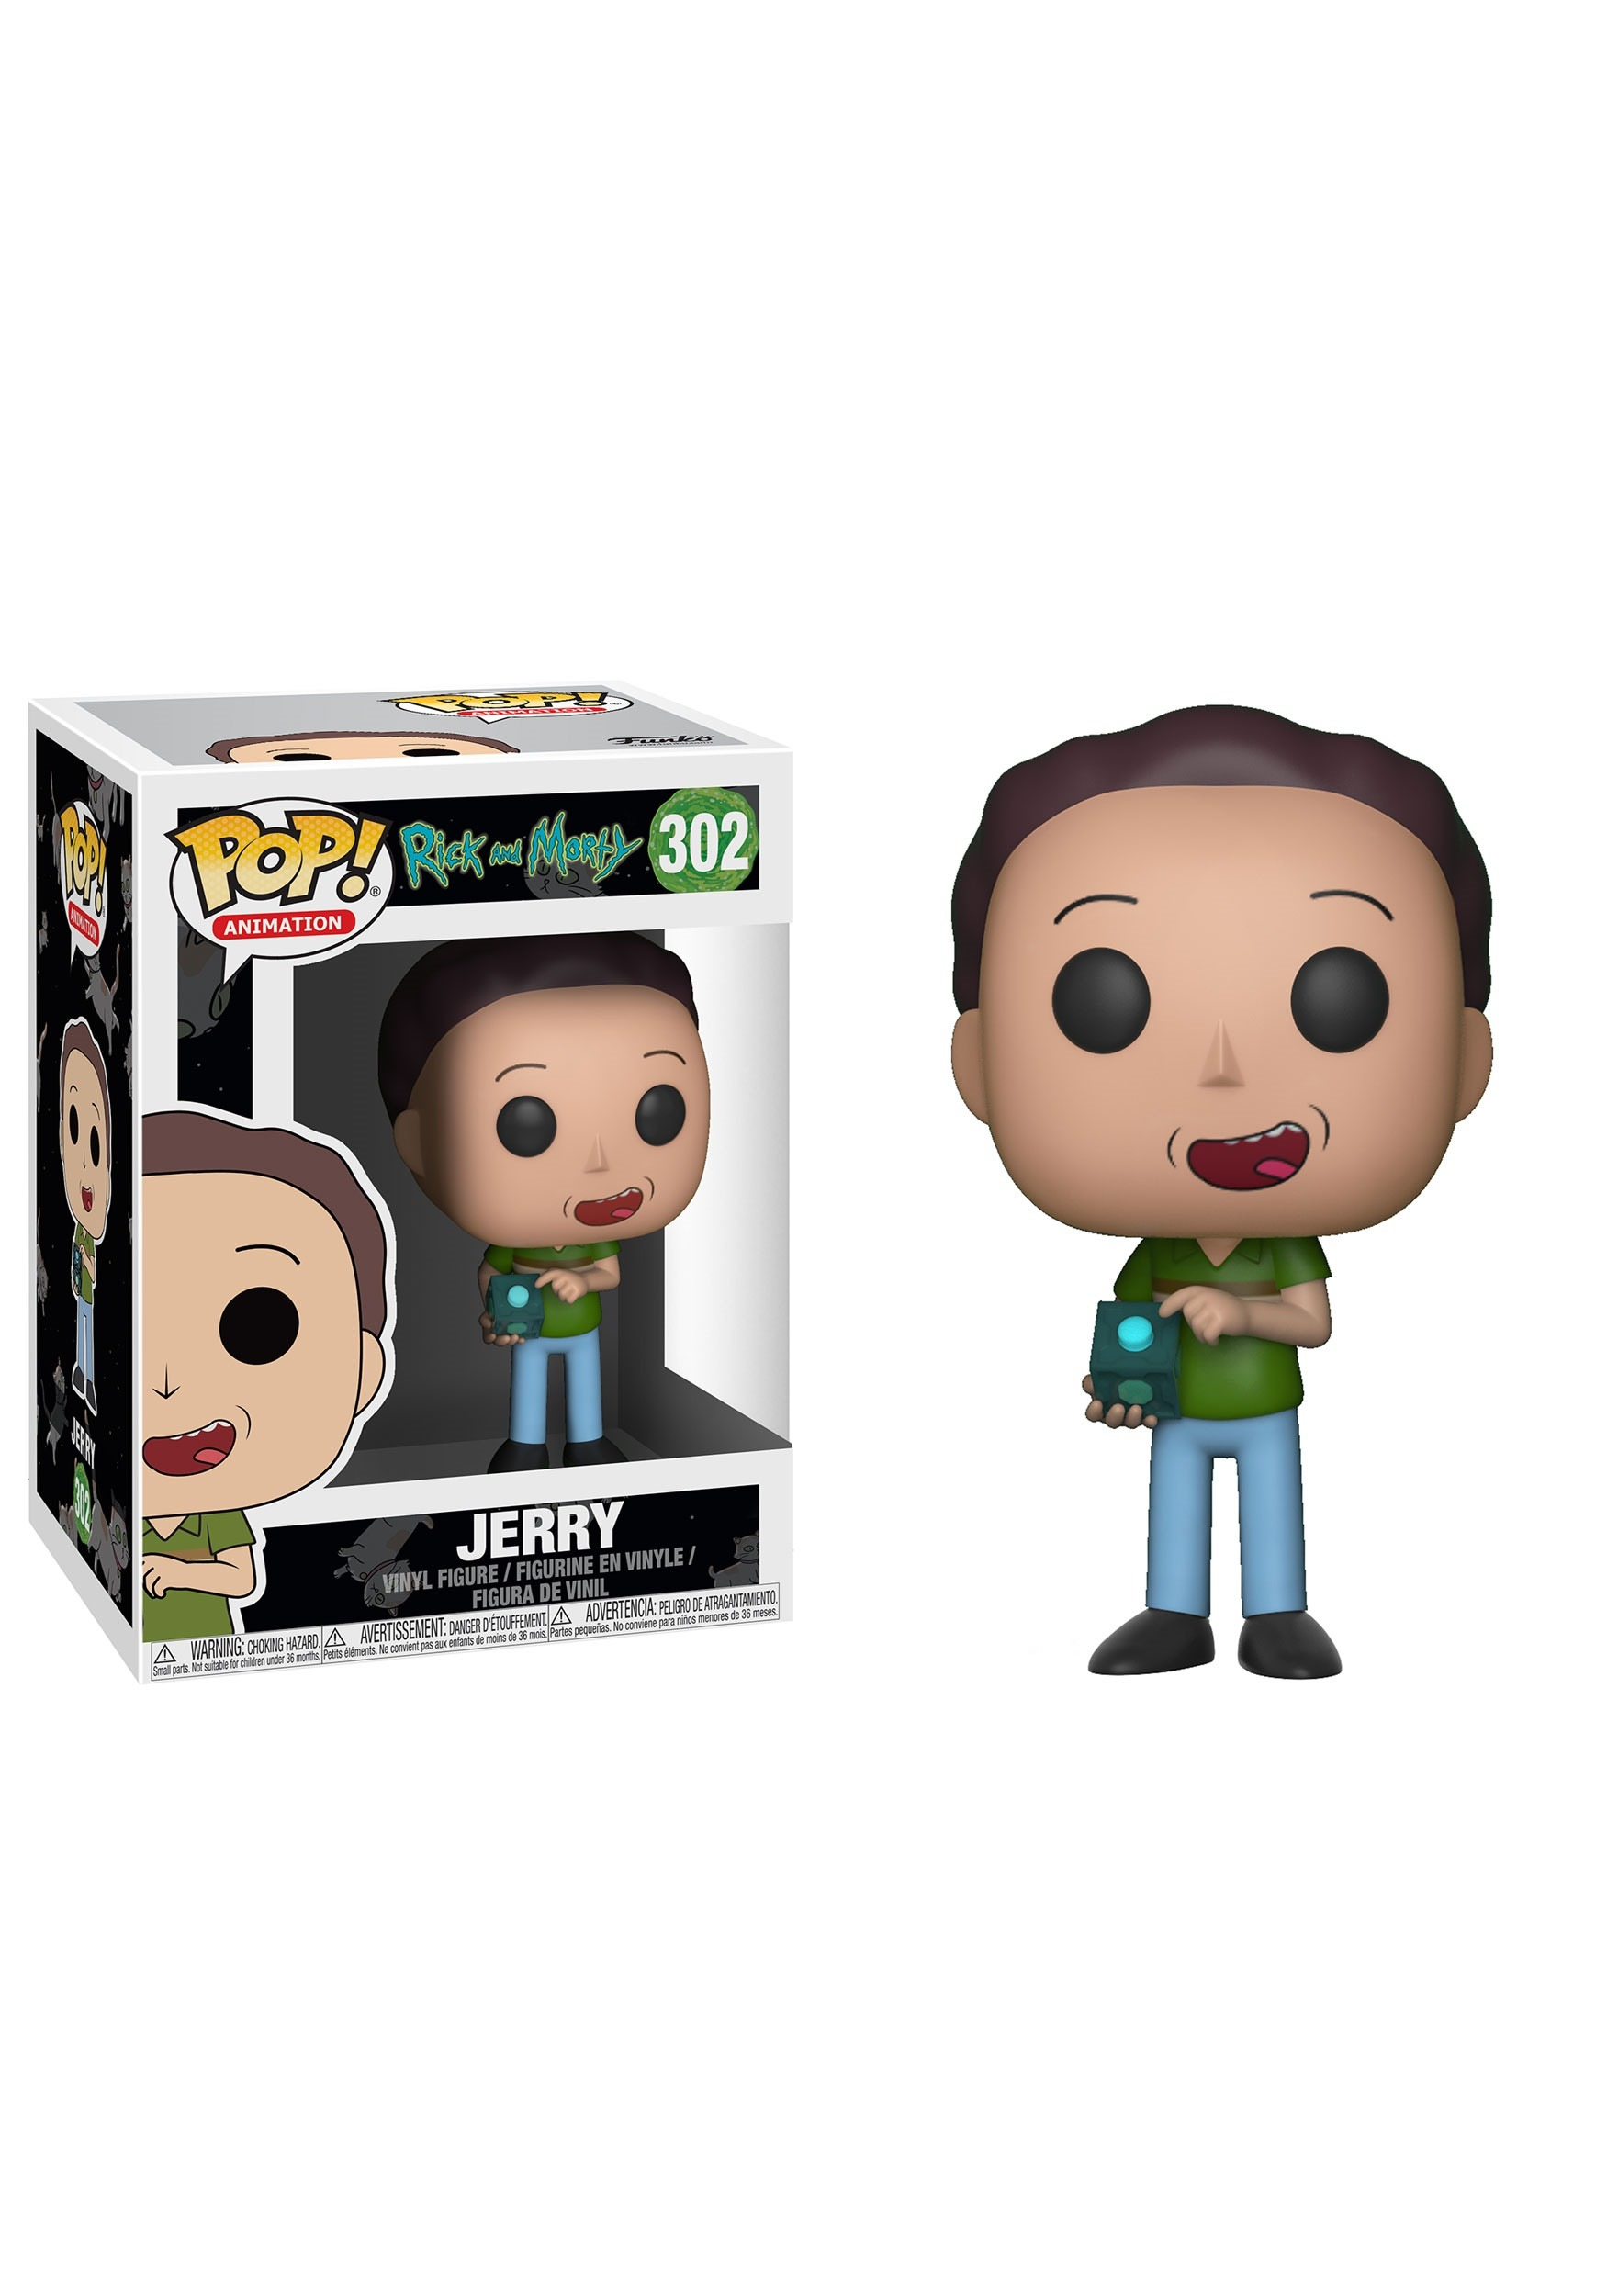 Jerry - Pop! Rick and Morty Vinyl Figure